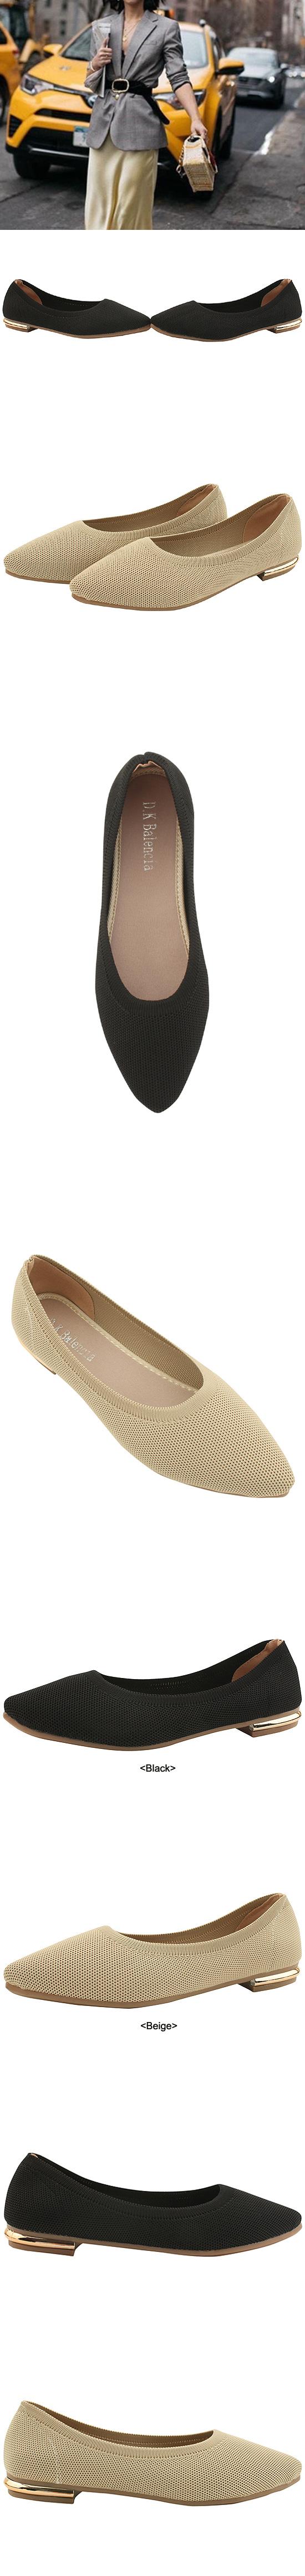 Soft Stiletto Knit Flat Shoes Black